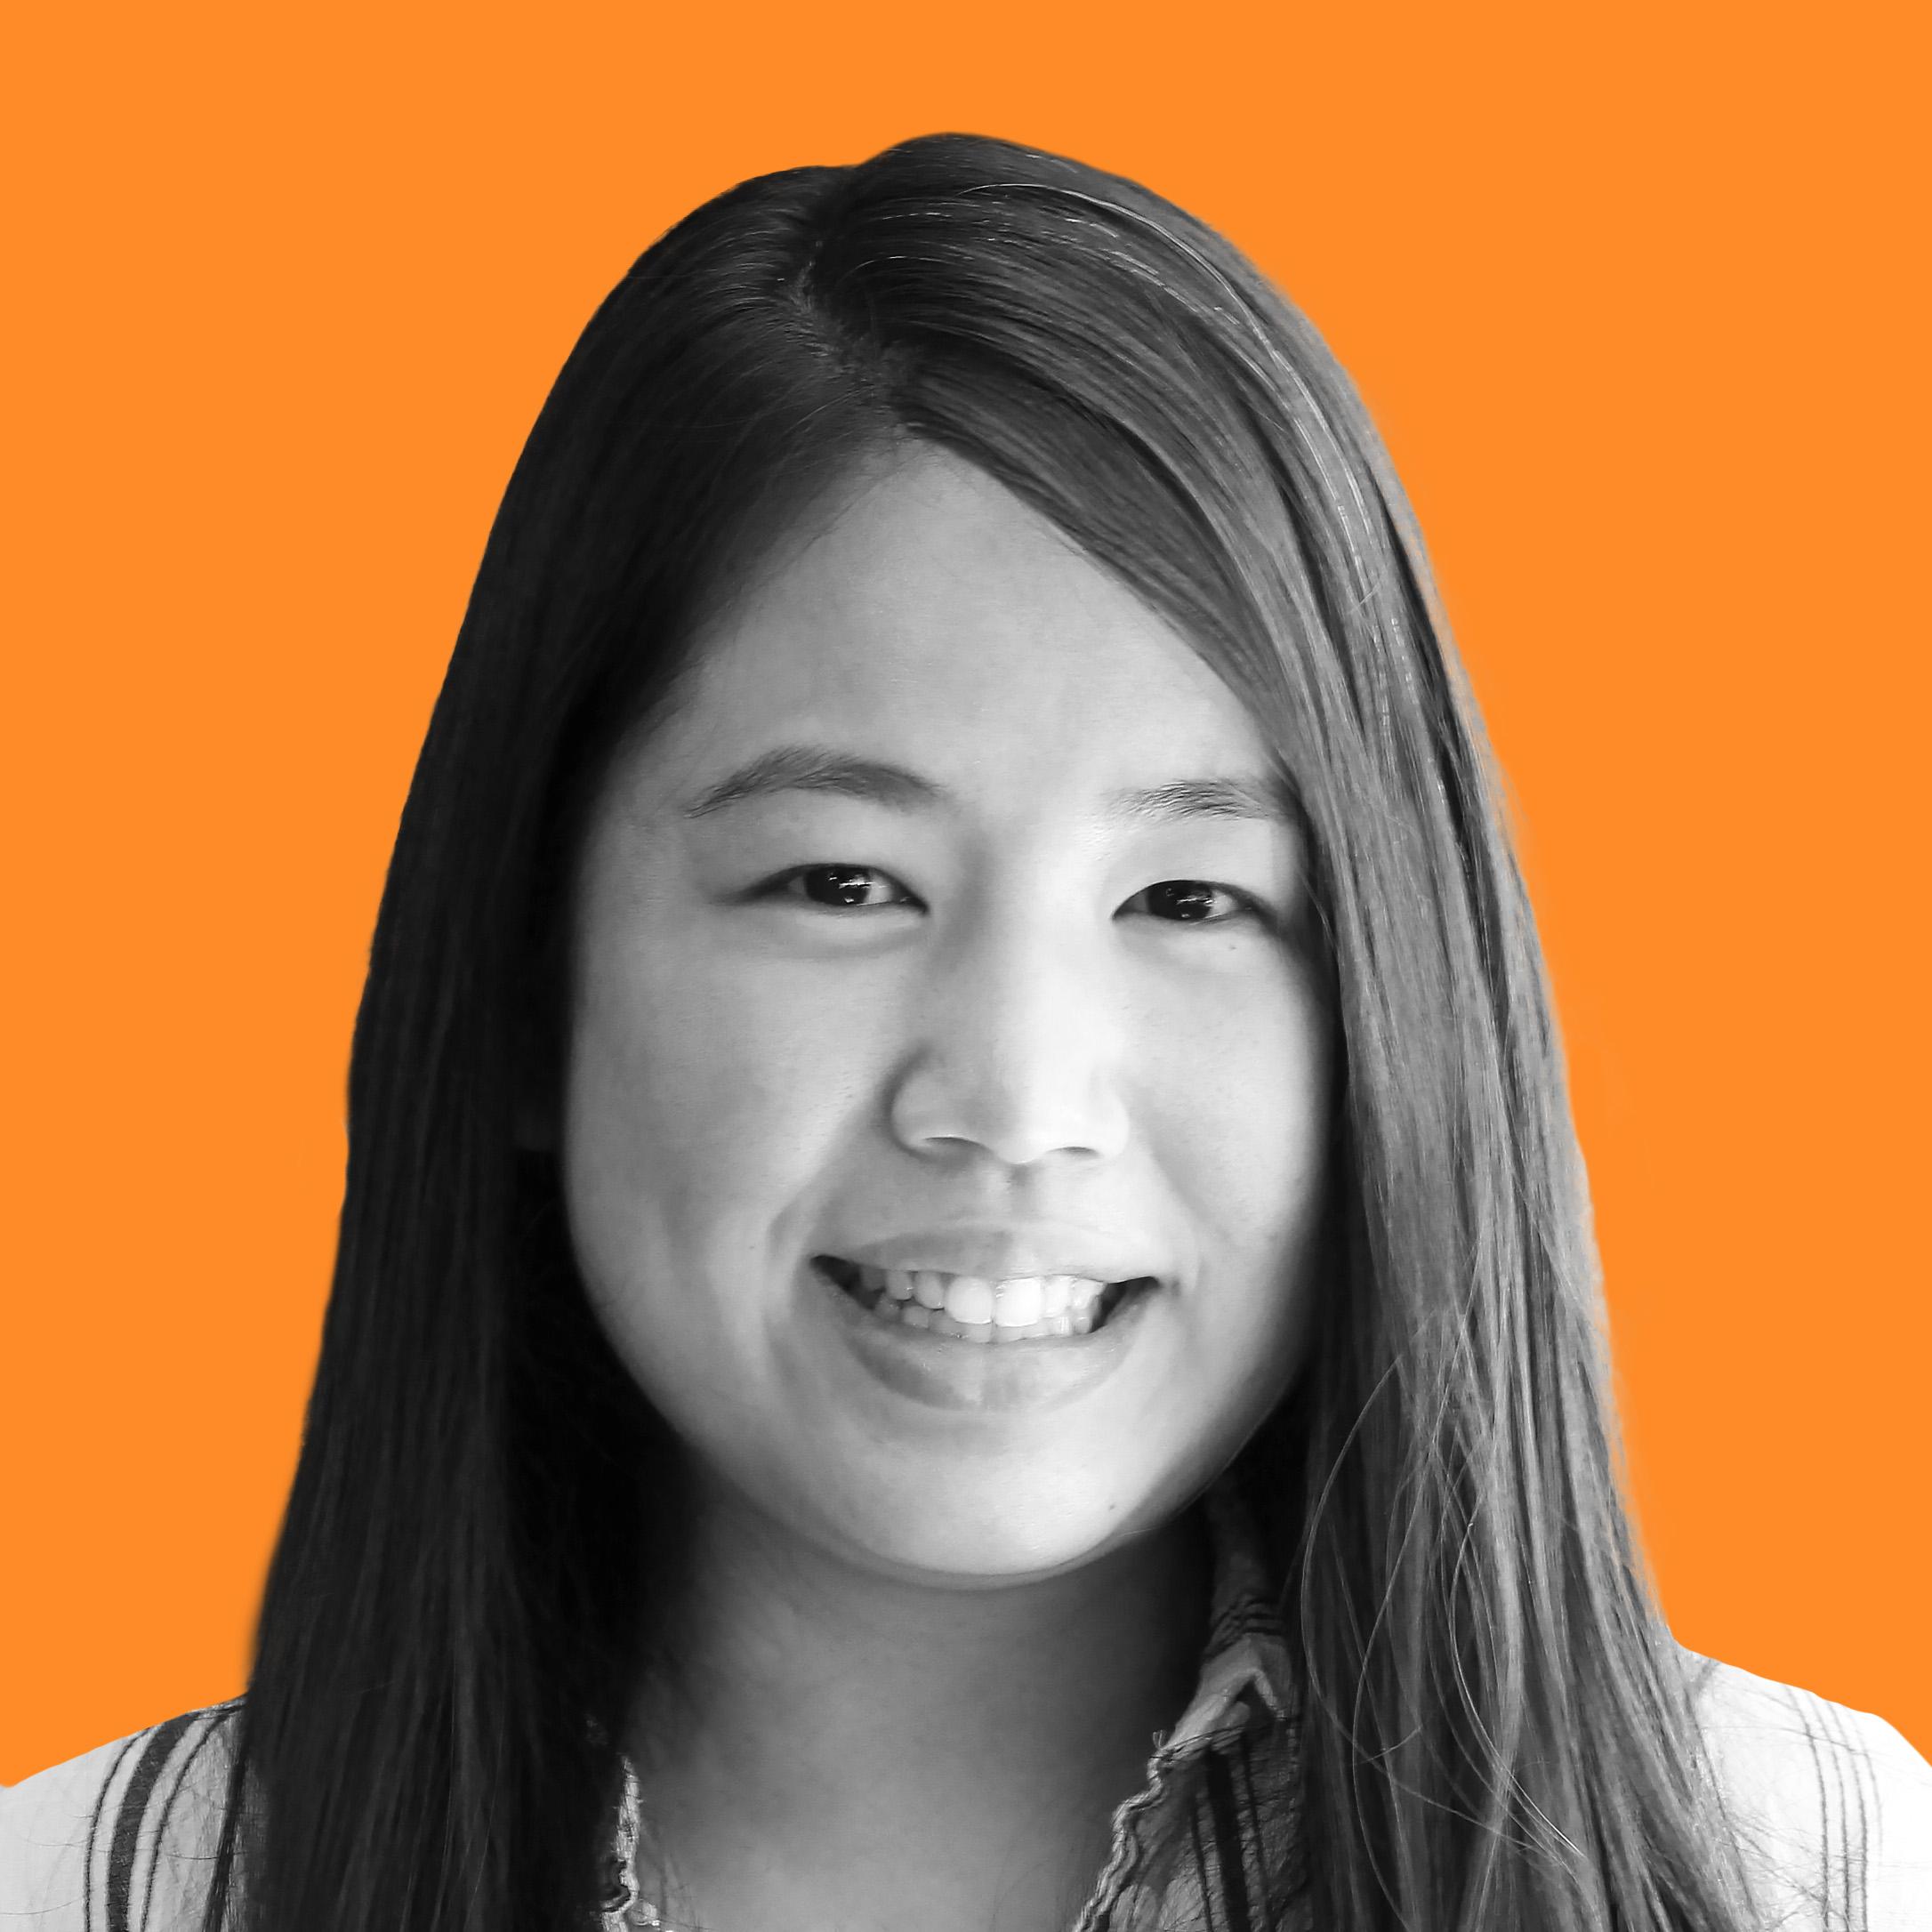 Tammy Hsu